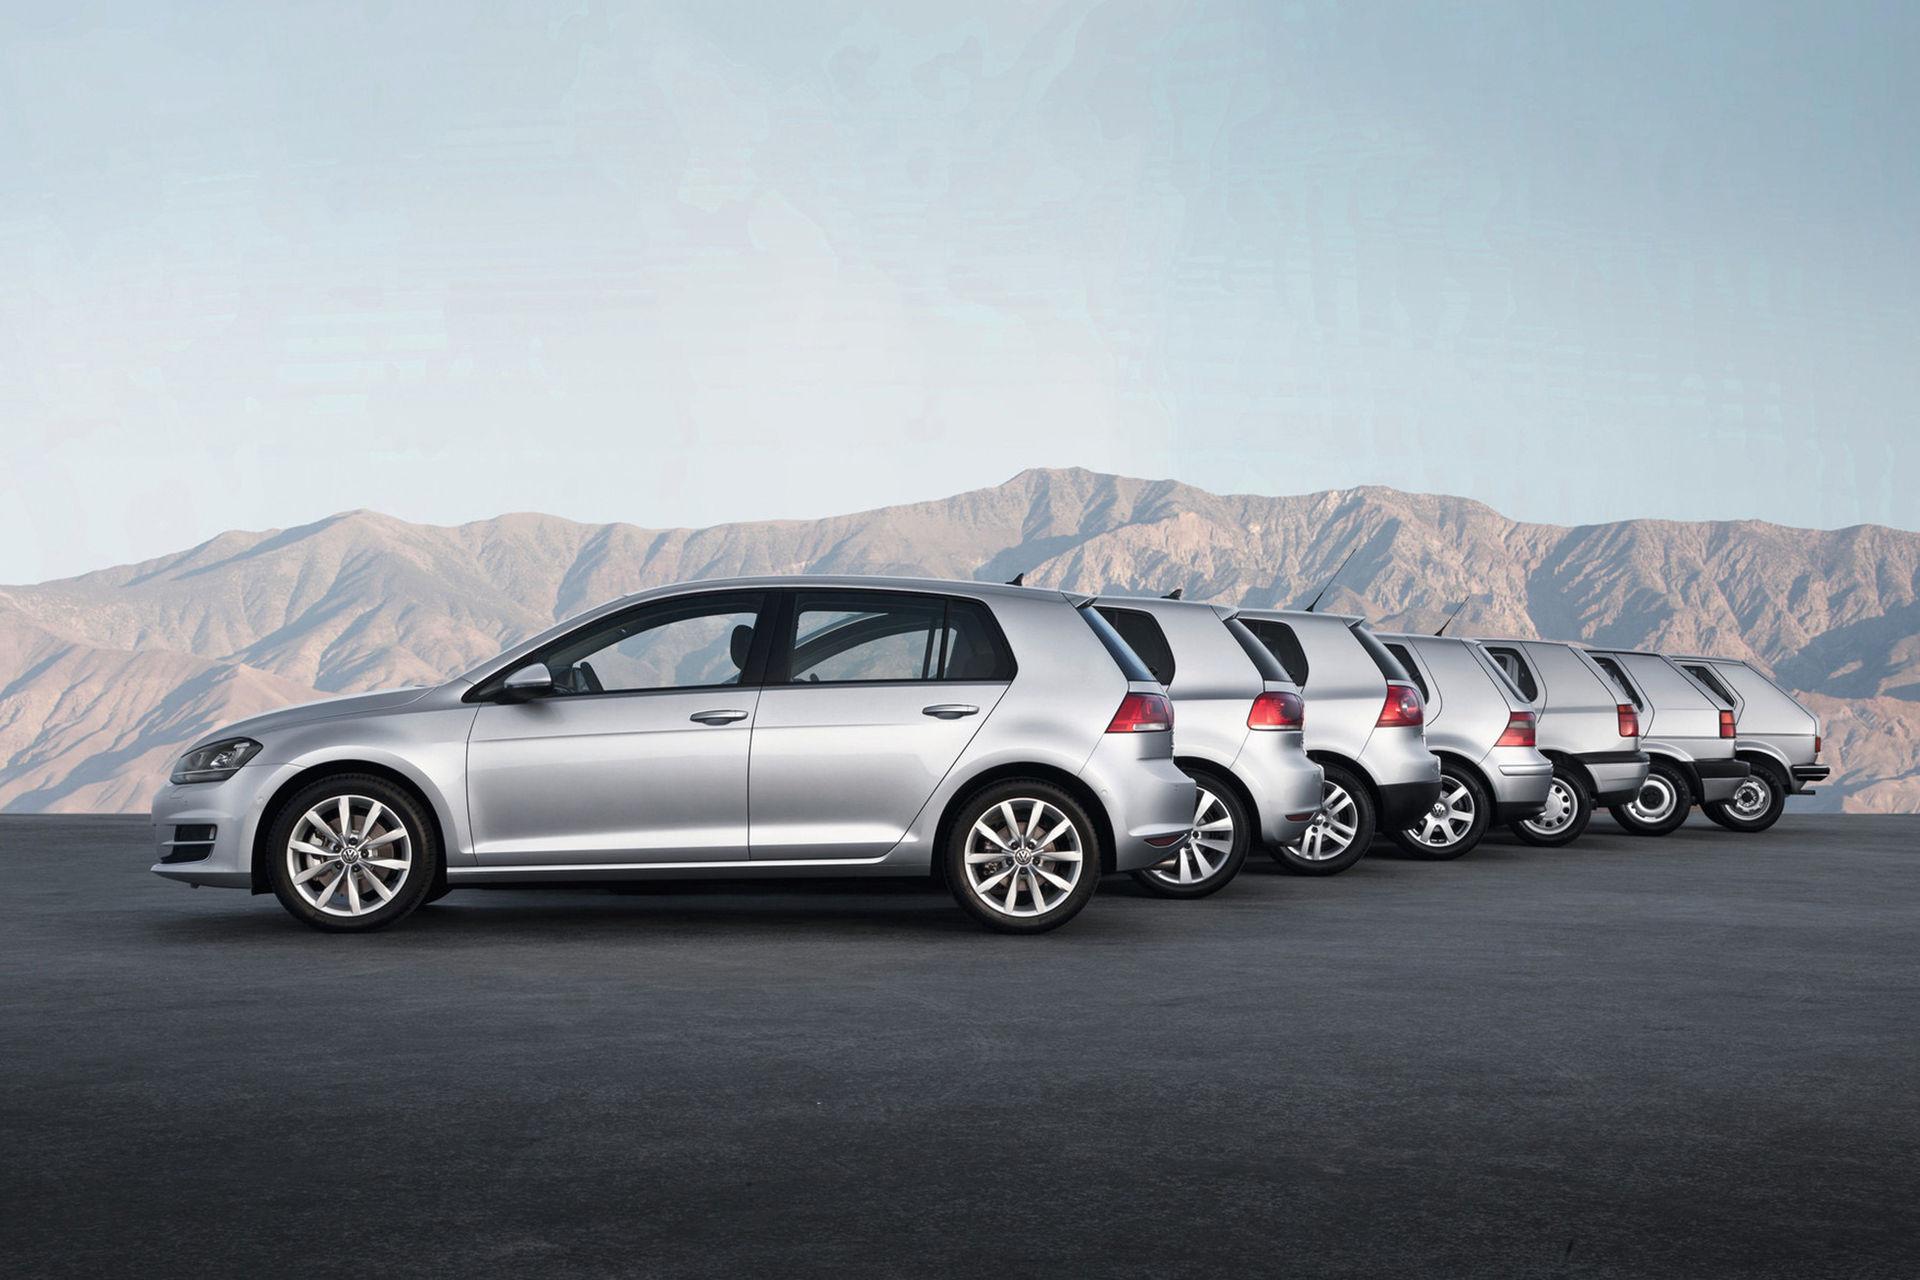 Tut i luren! Idag fyller Volkswagen Golf 45 år!